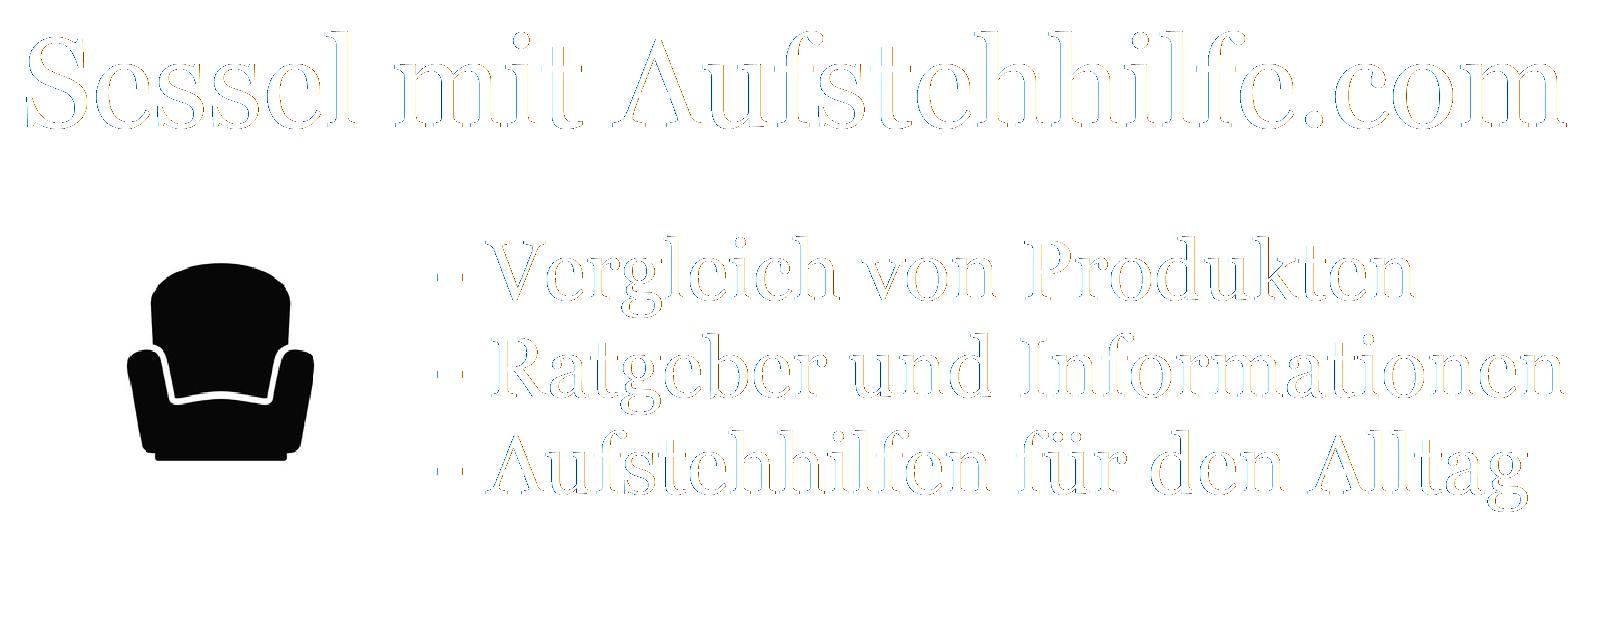 www.sessel-mit-aufstehhilfe.comzuiziuzizi